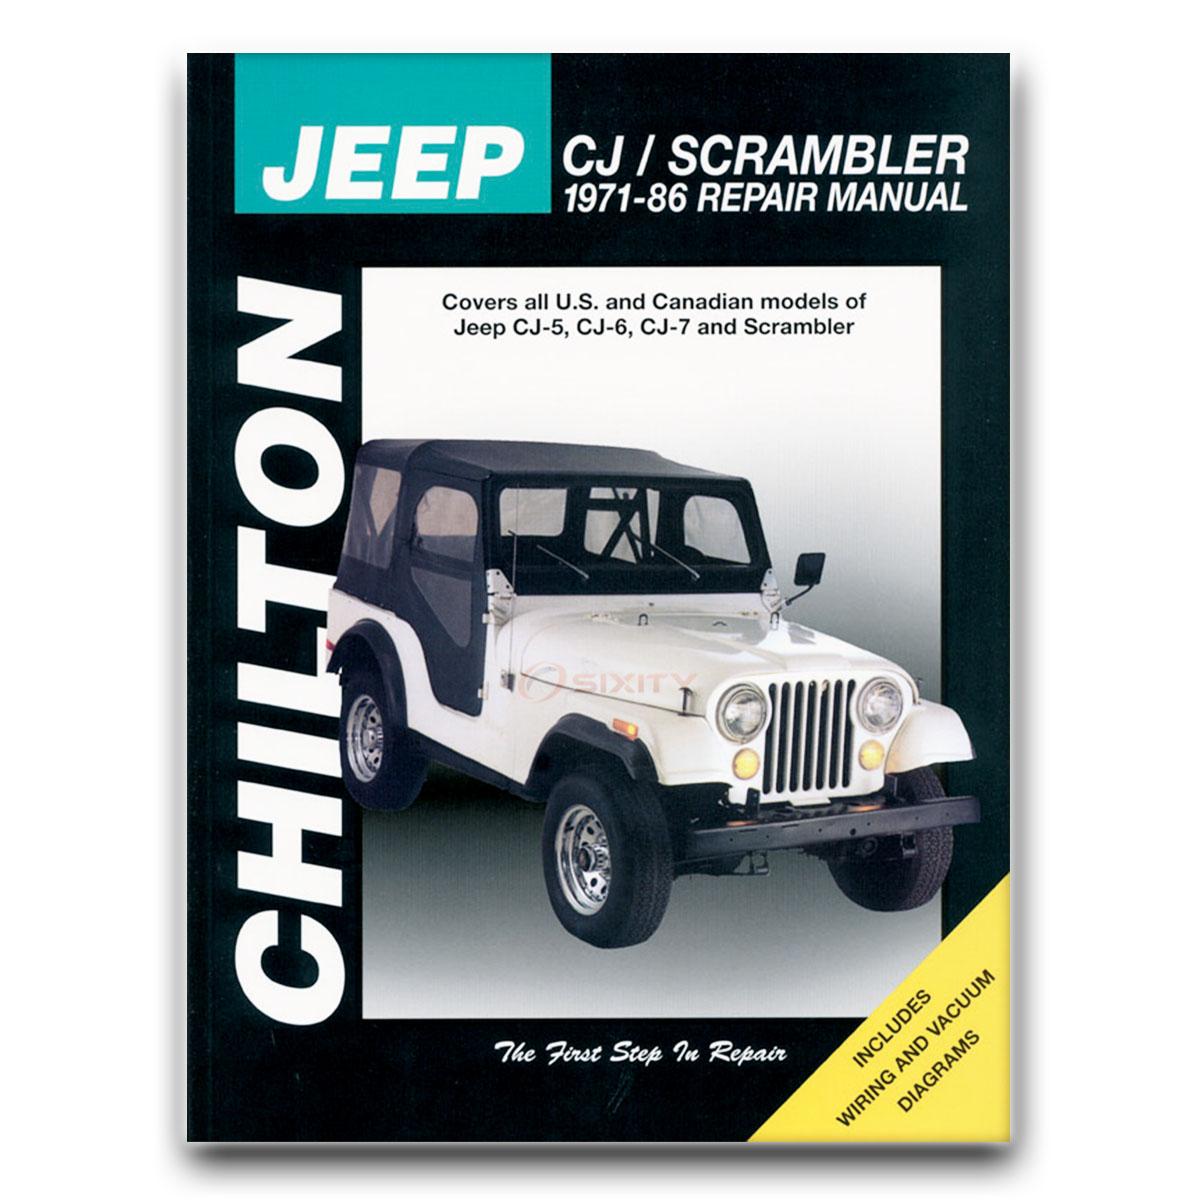 Chilton Repair Manual for Jeep CJ7 Base Golden Eagle Hawk Renegade Laredo td